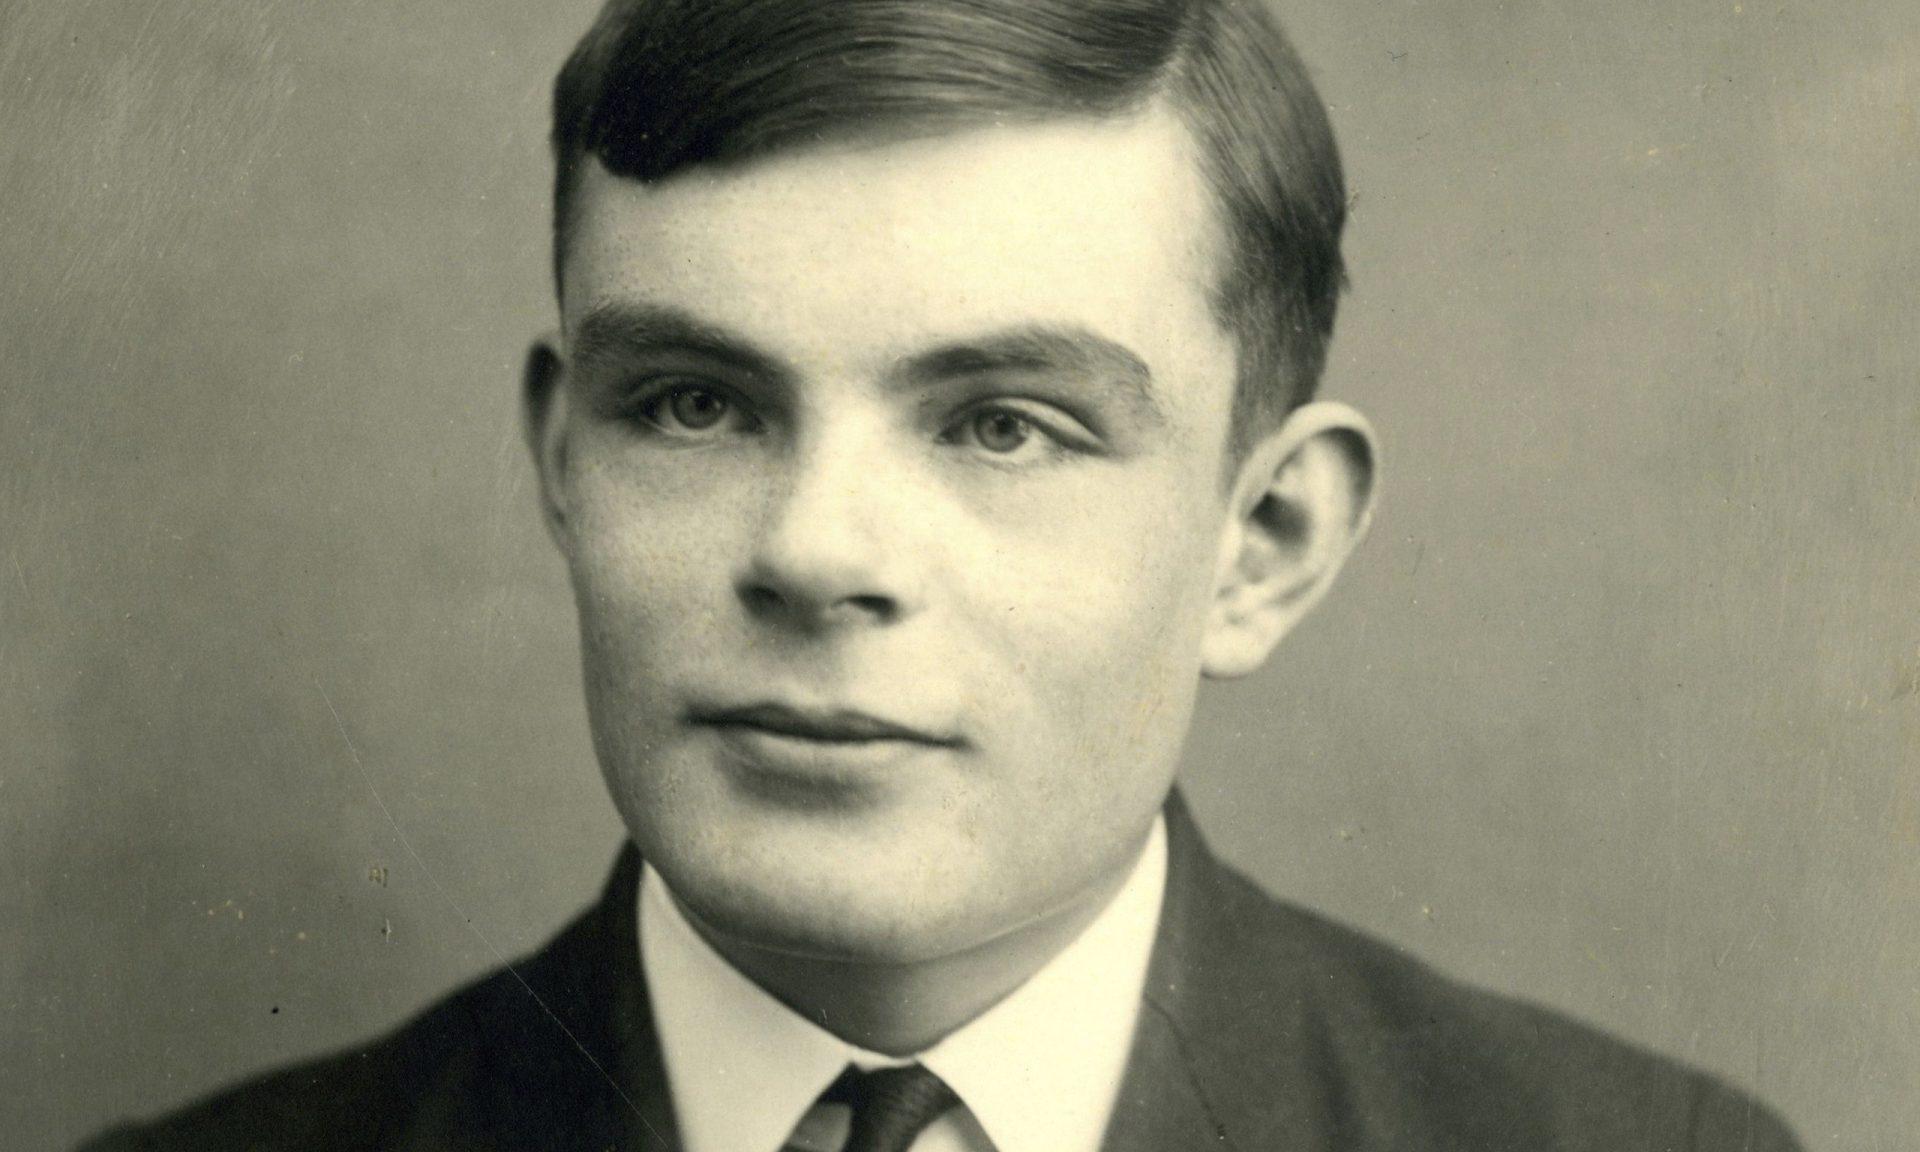 Mentes Brilhantes: Alan Turing (1912 - 1954)